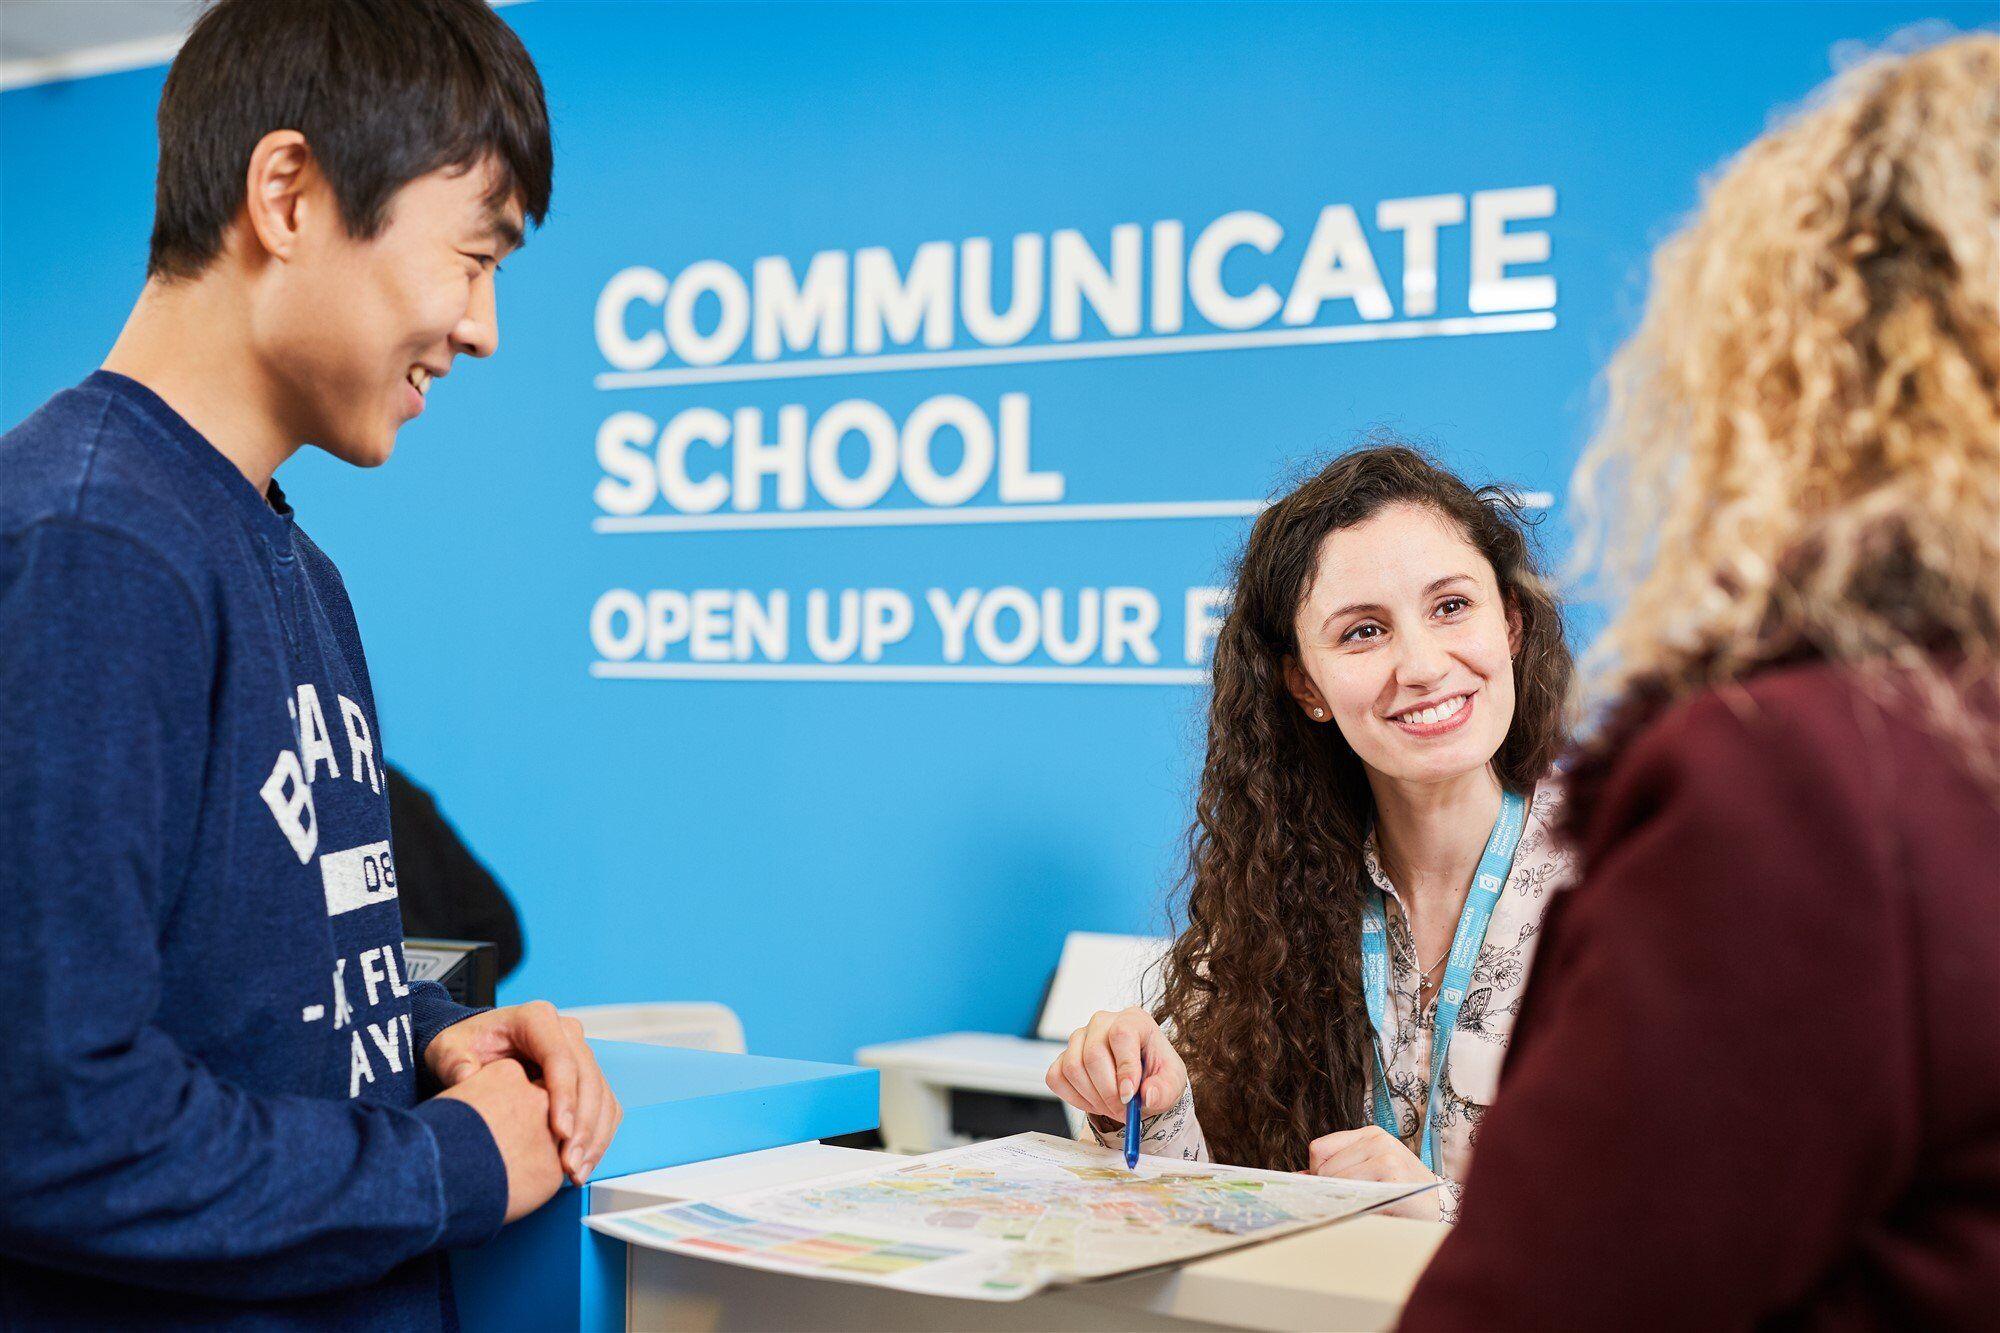 communicate school manchester malvern plc subisdairy